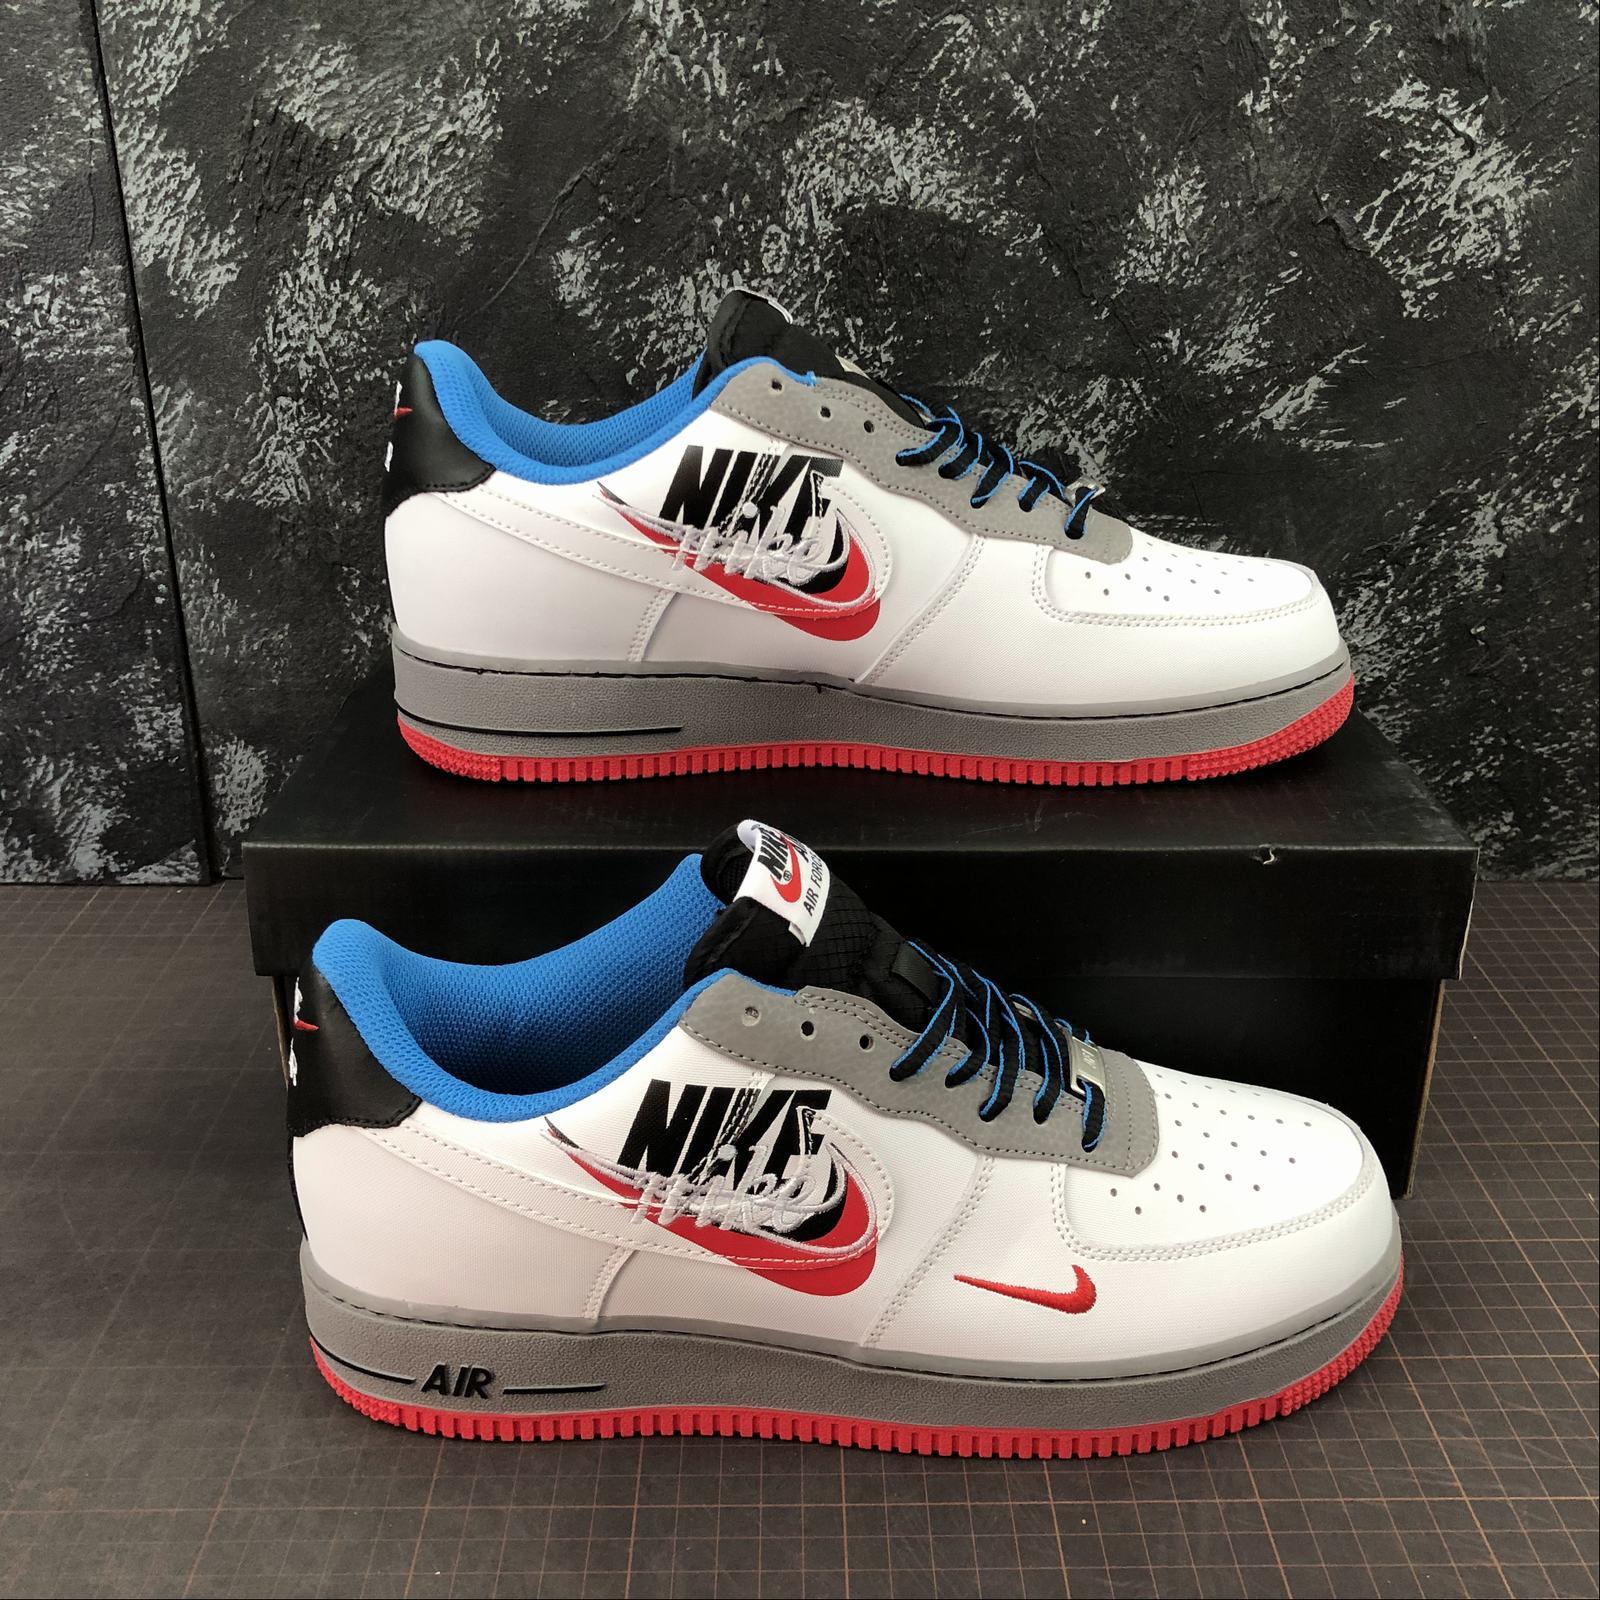 giay-sneaker-nike-air-force-1-07-ao2441-100-da-beige-white-brown